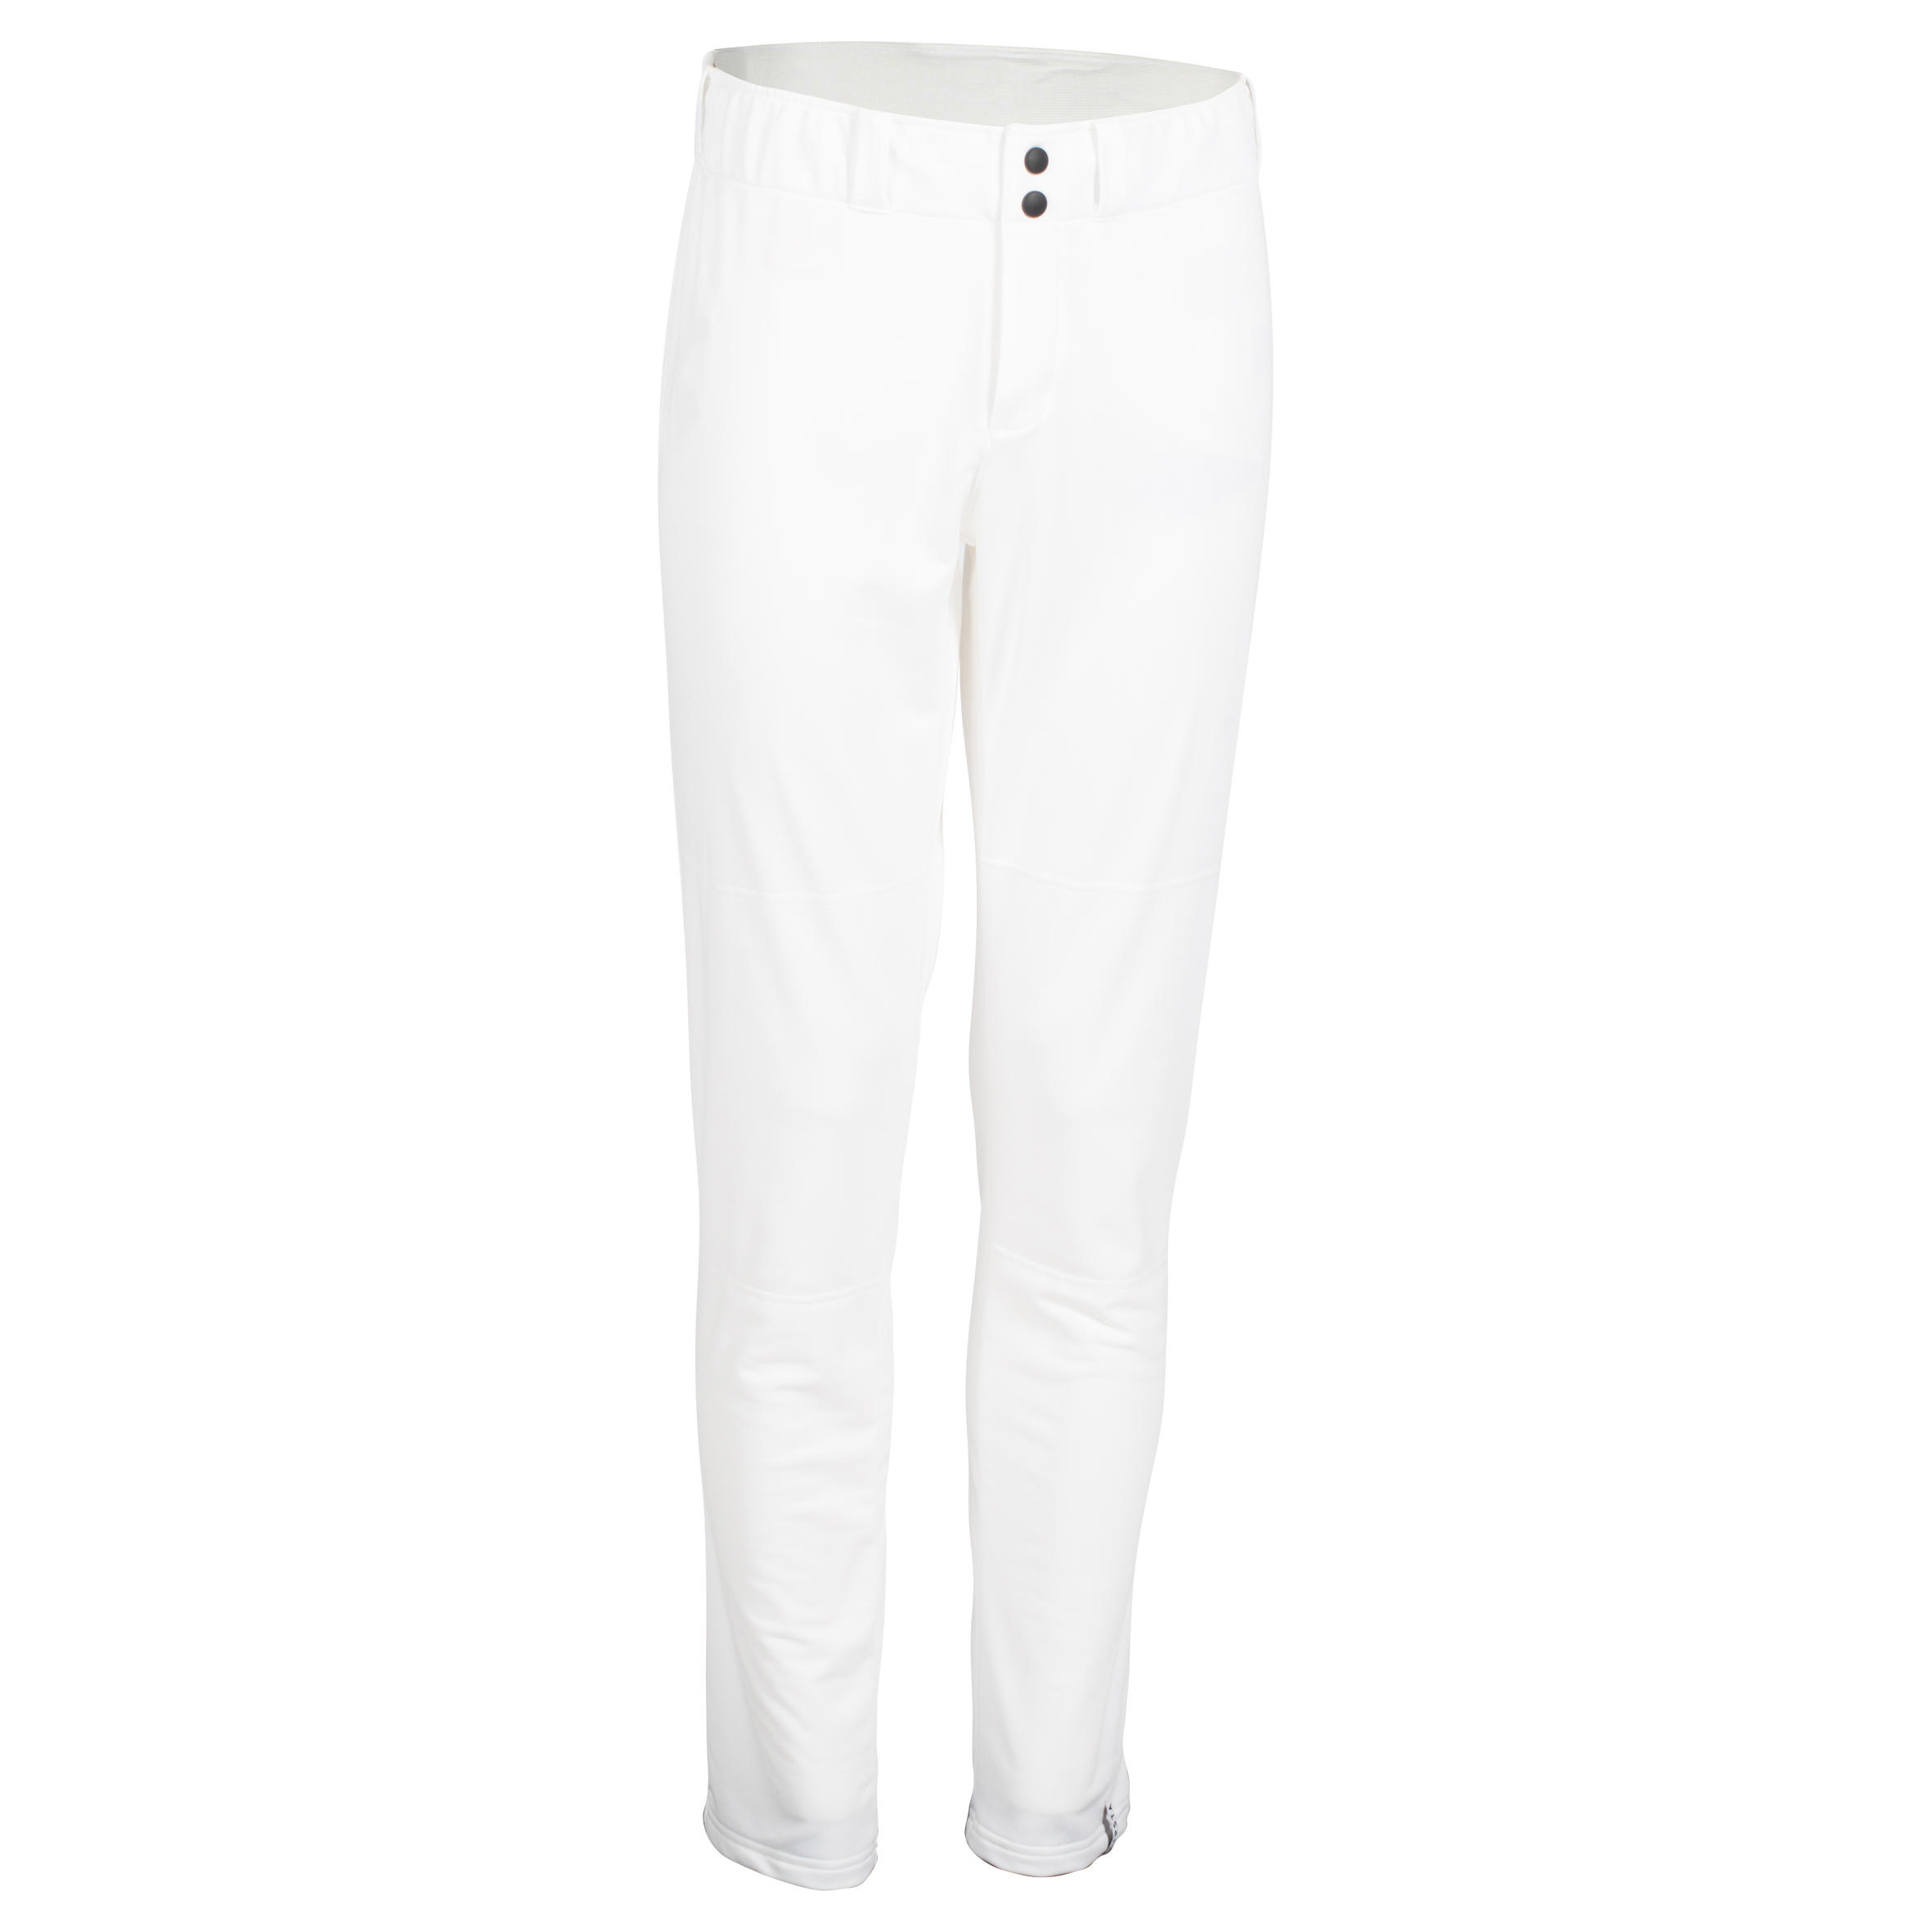 Pantalon BA 550 Alb imagine